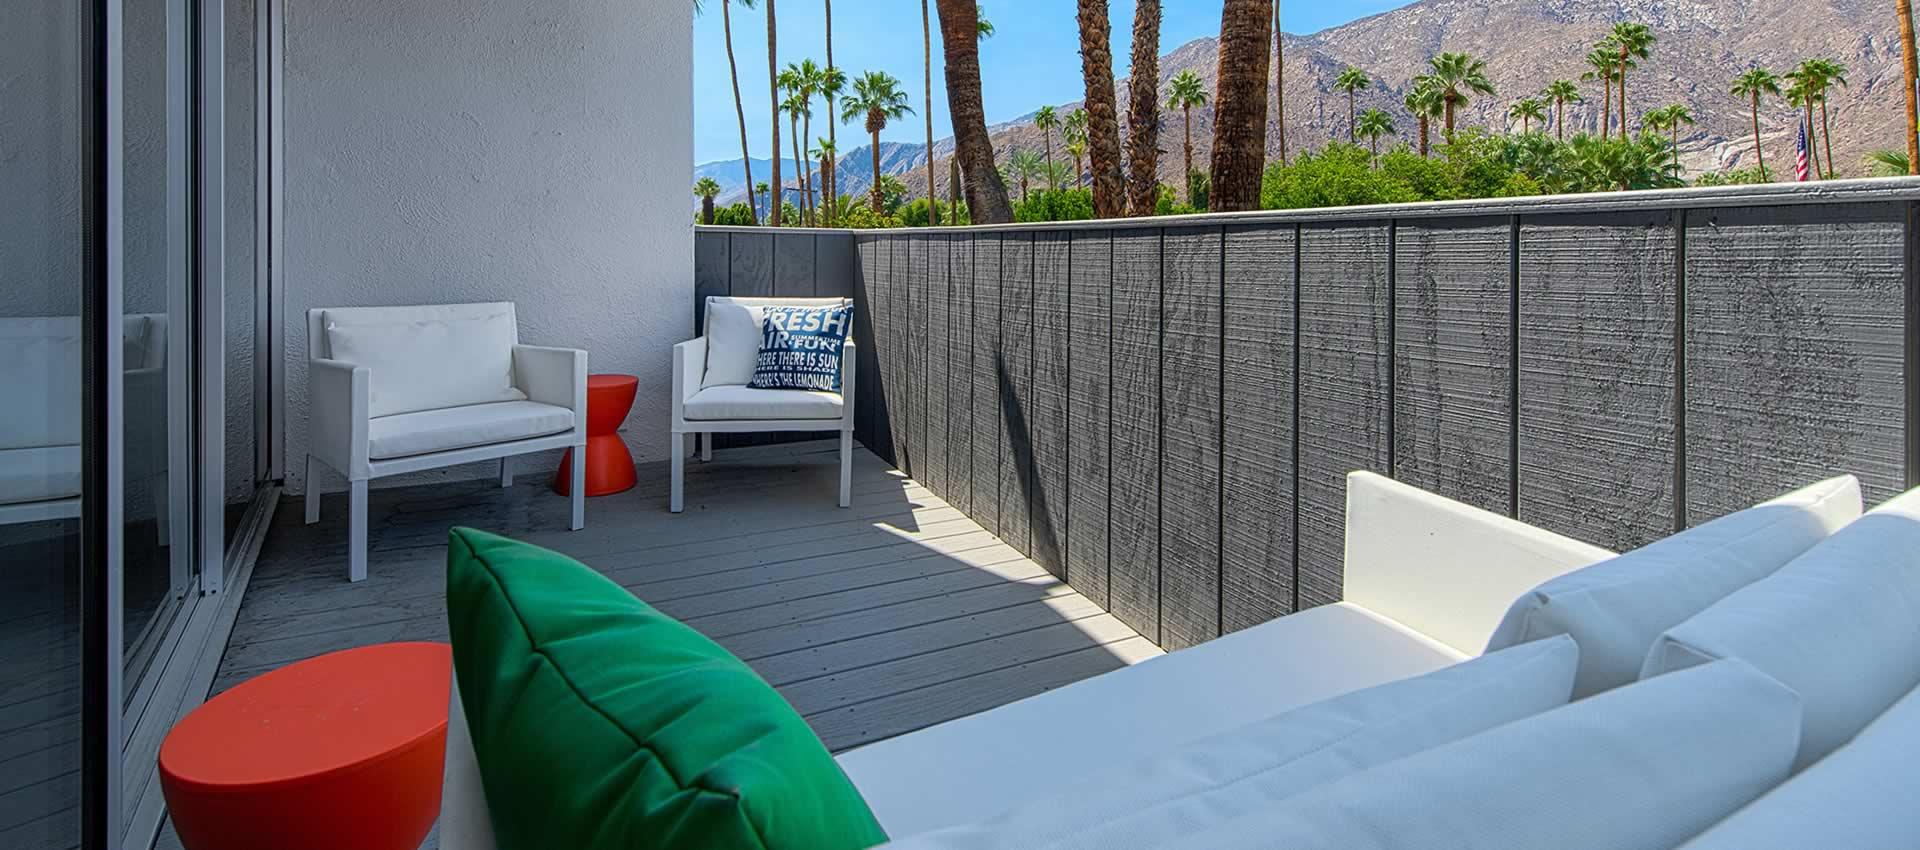 twist hotel studio room balcony mountains palm trees